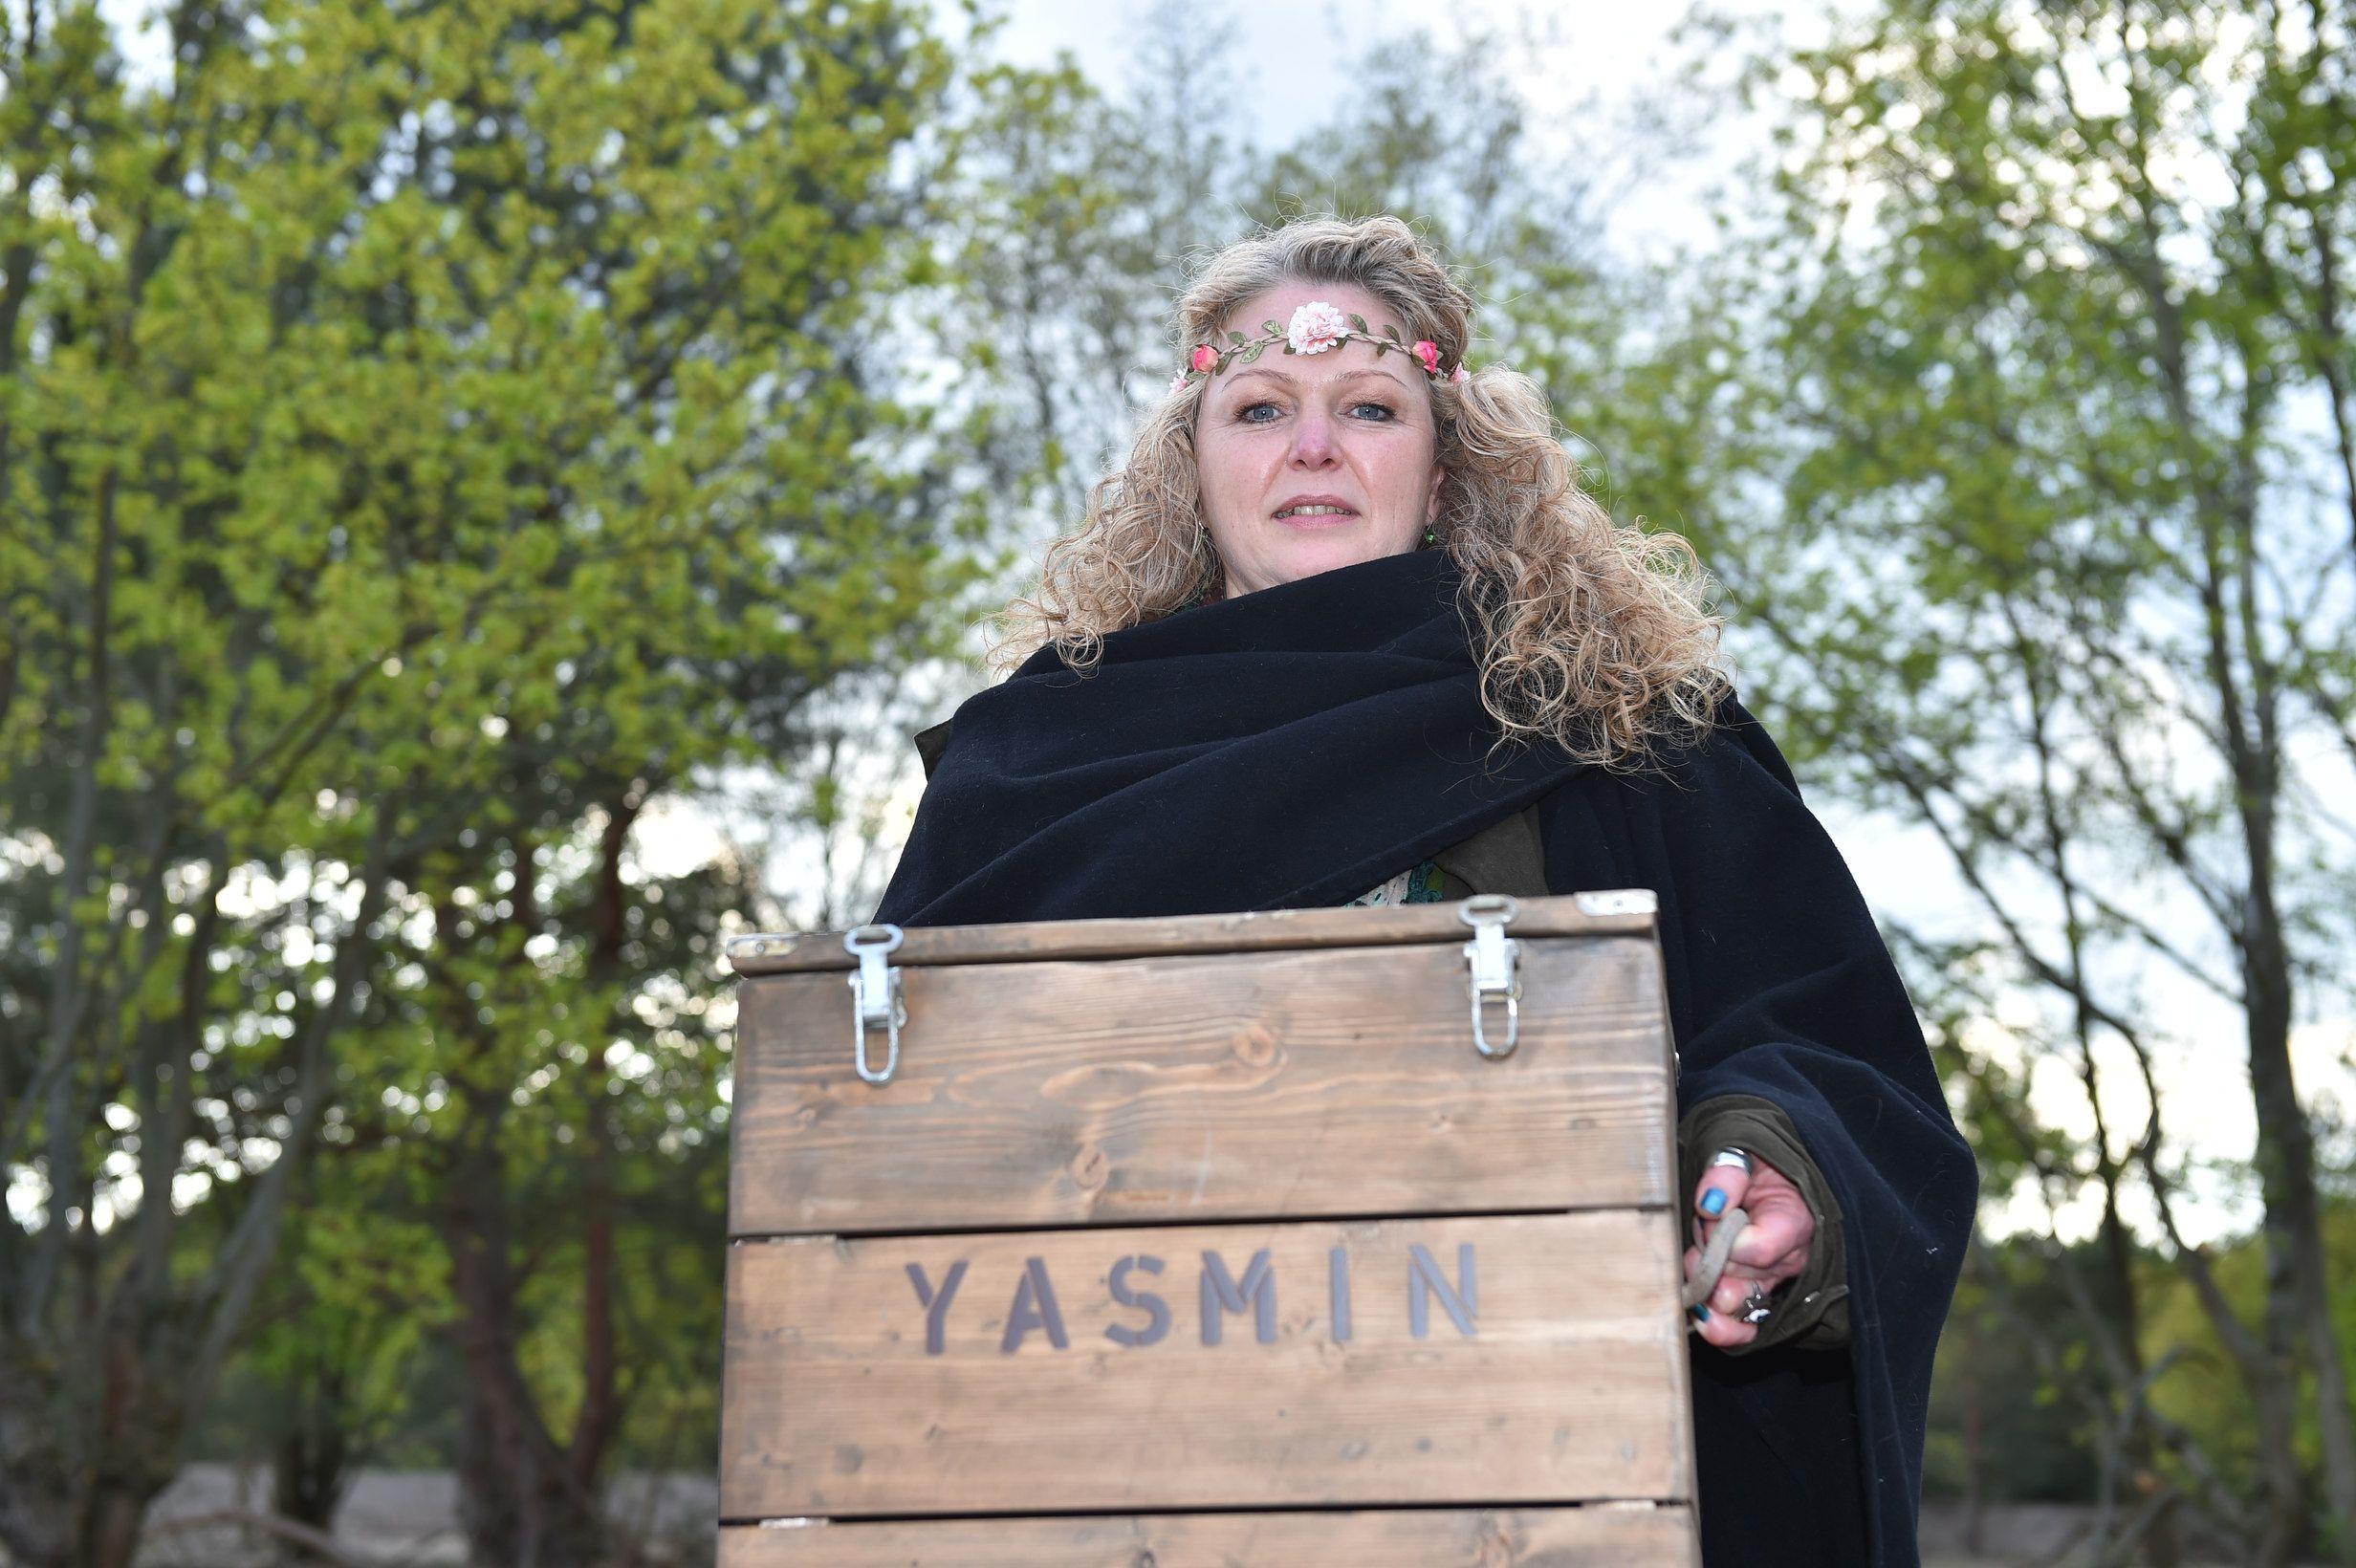 Newtopia Pionierin Yasmin.